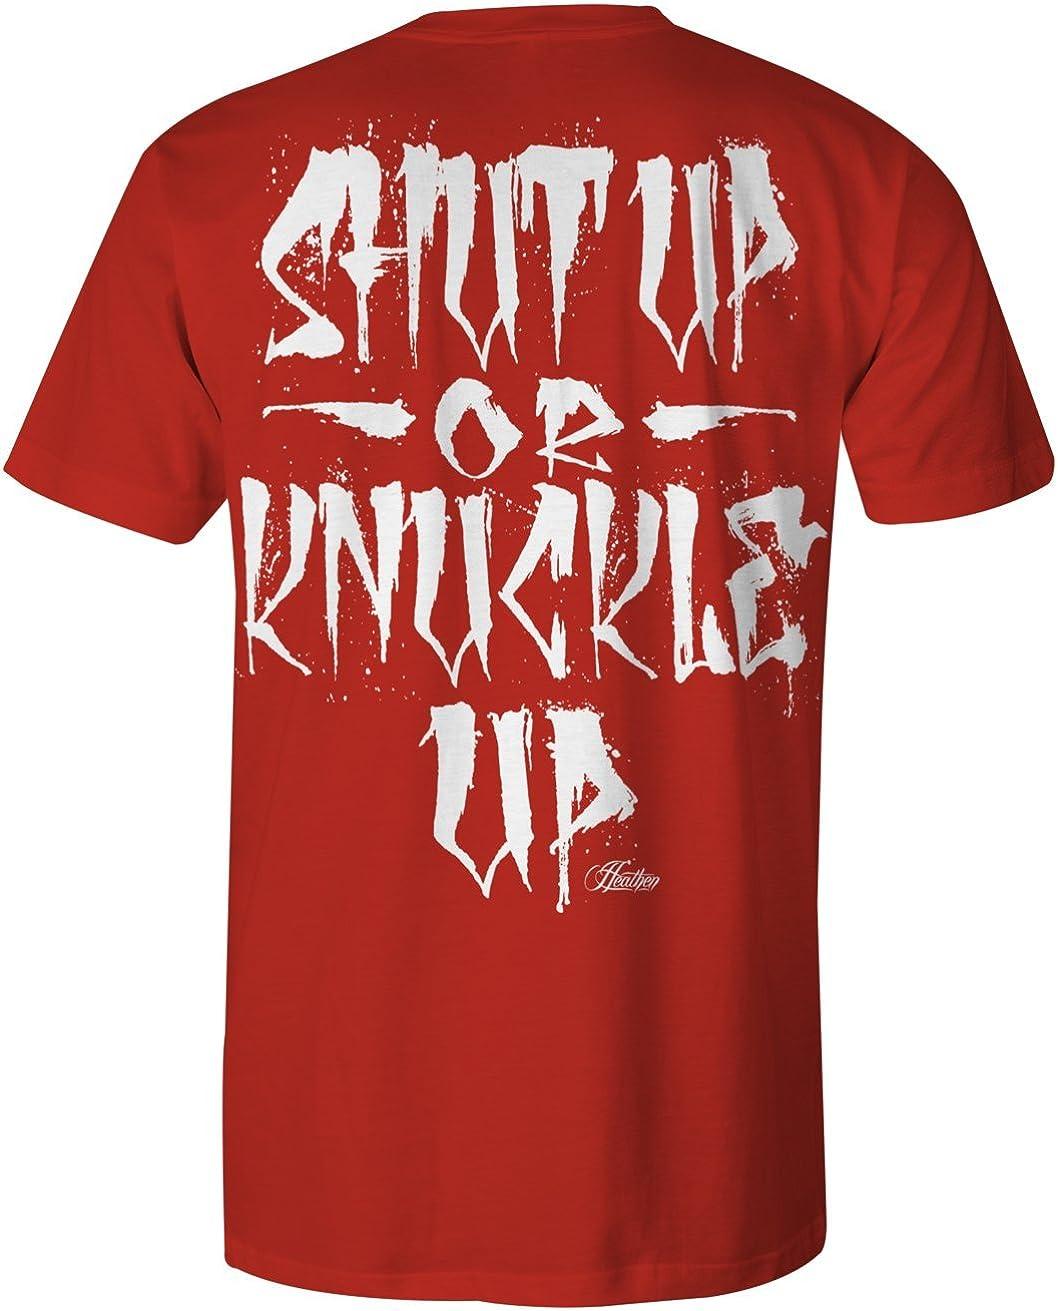 Heathen Knuckle Up T-Shirt